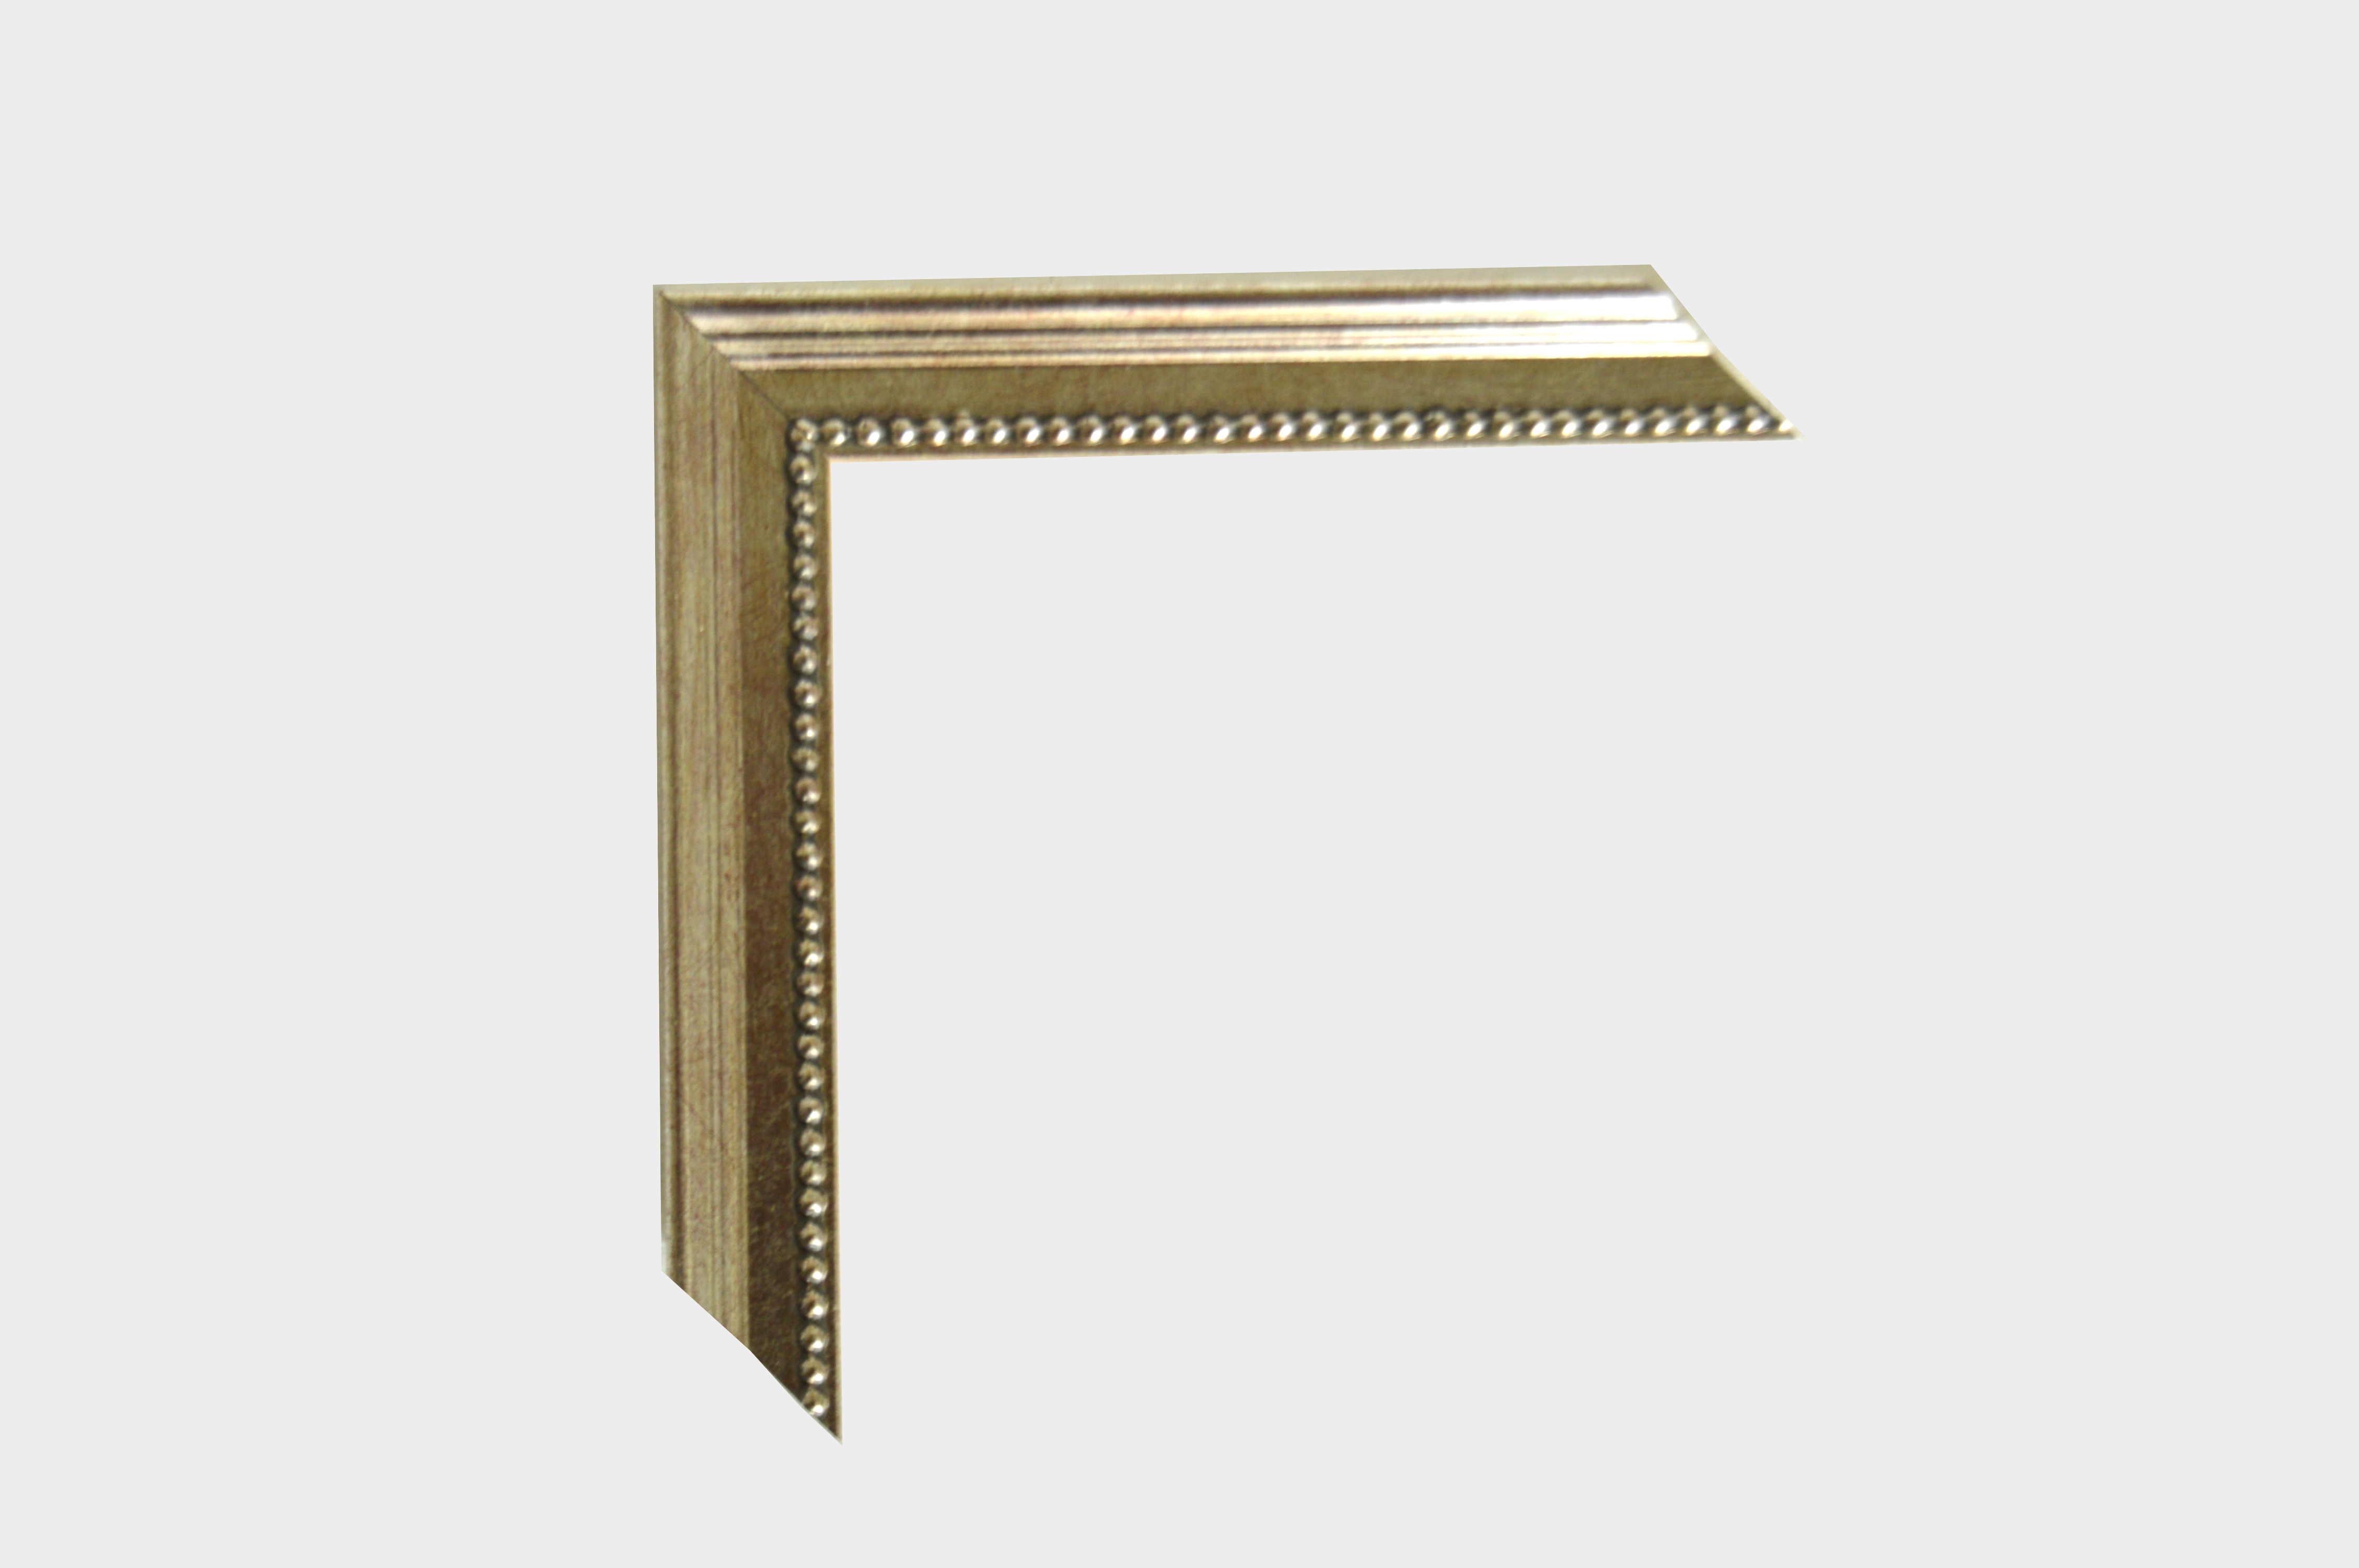 00751-770-PLATA-ancho2.7cm